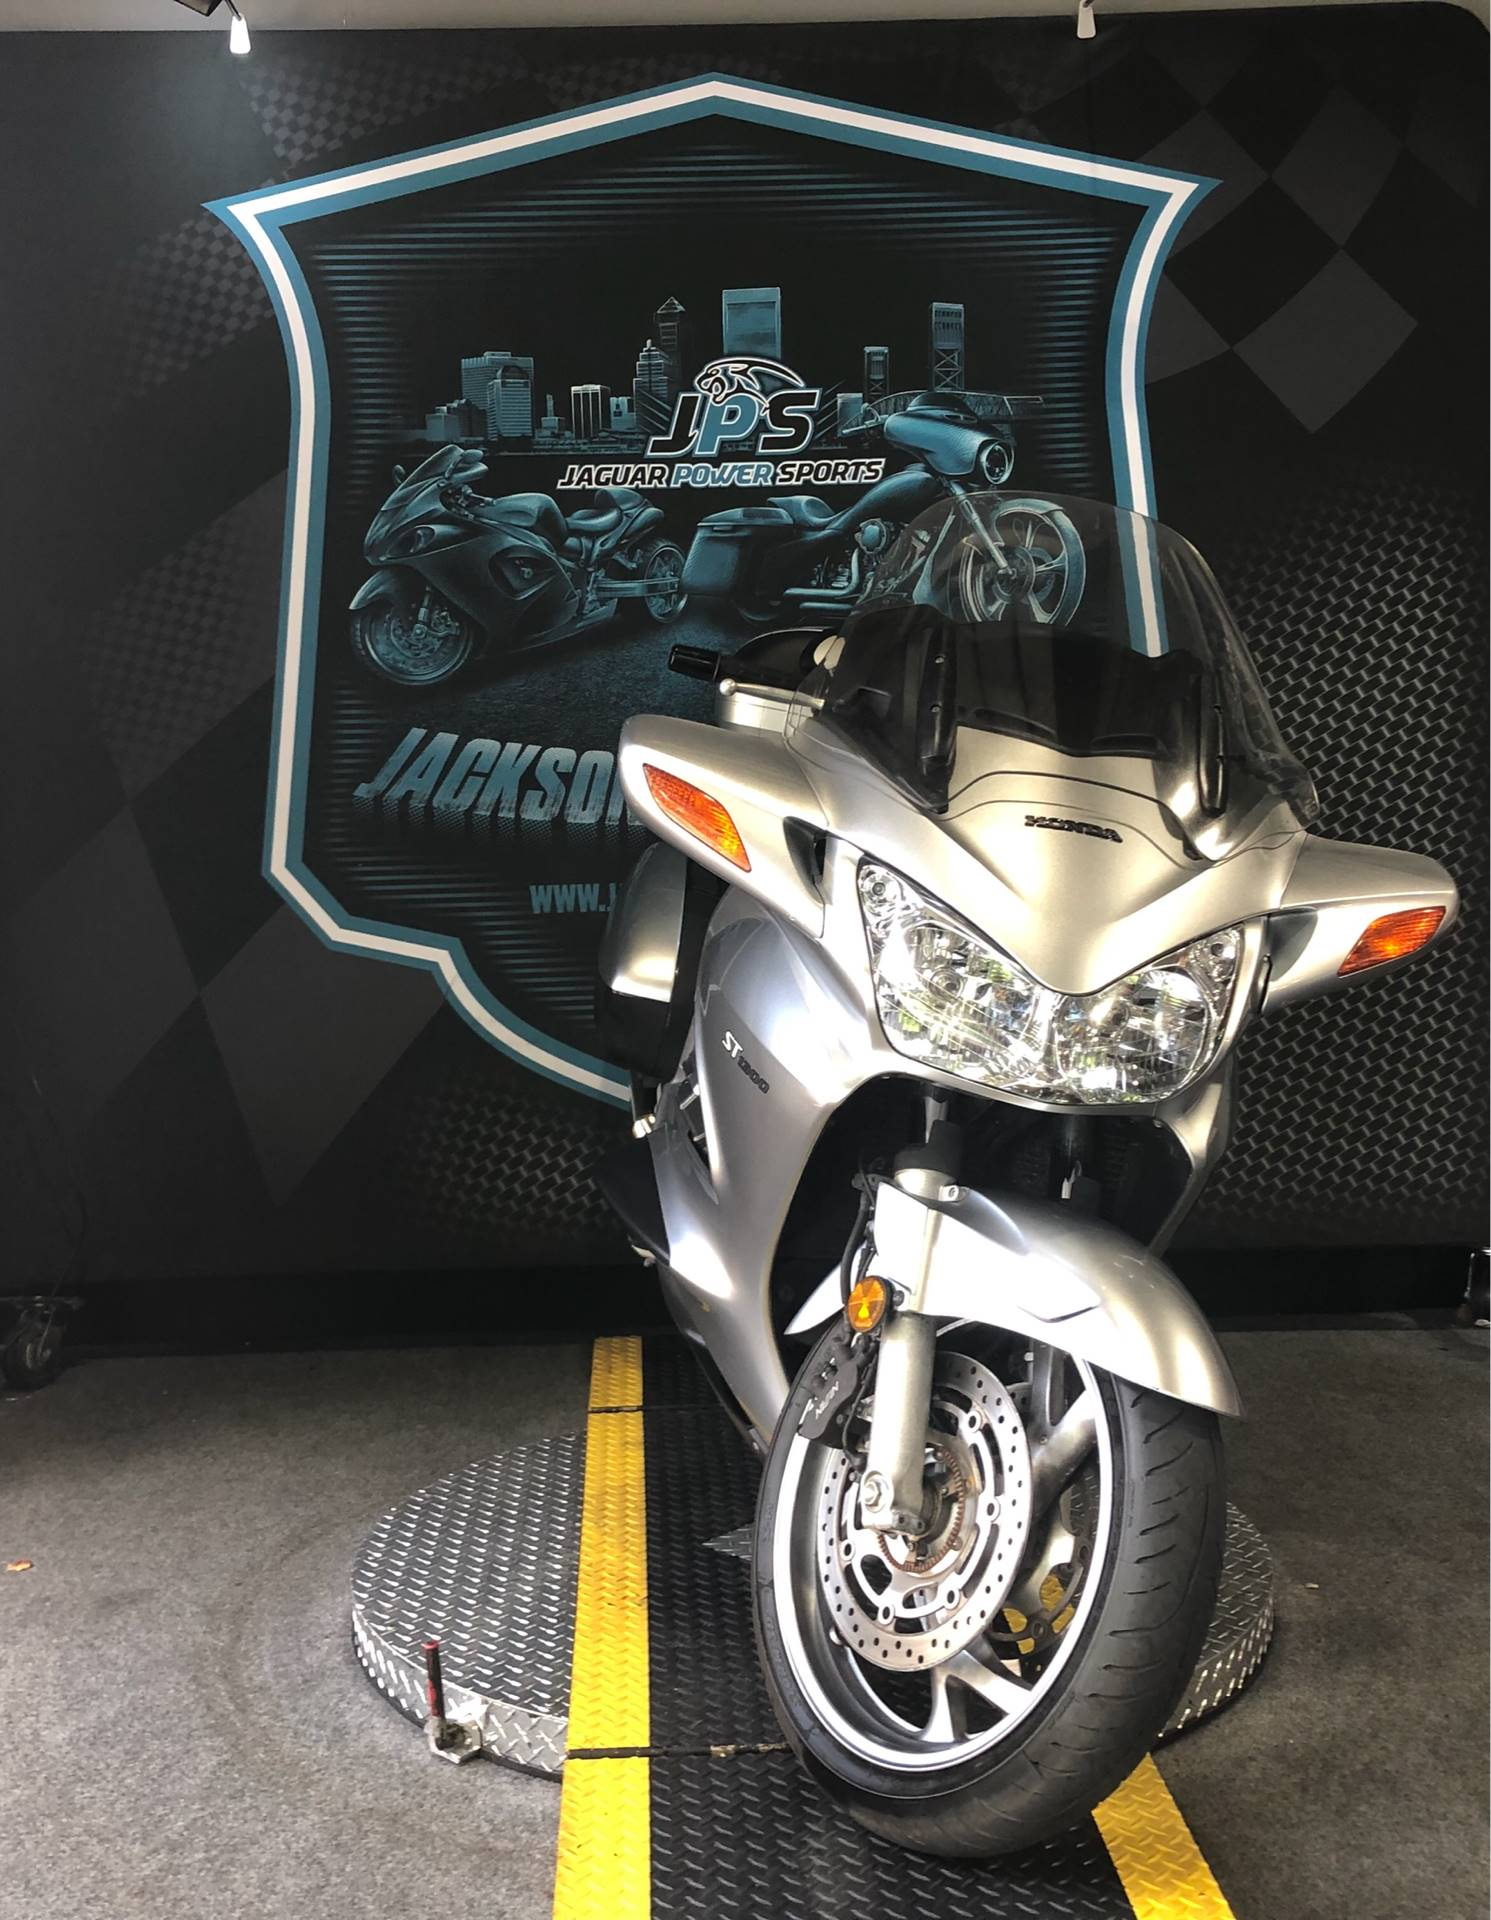 used 2007 honda st 1300 abs motorcycles in jacksonville fl stock number hon500701. Black Bedroom Furniture Sets. Home Design Ideas